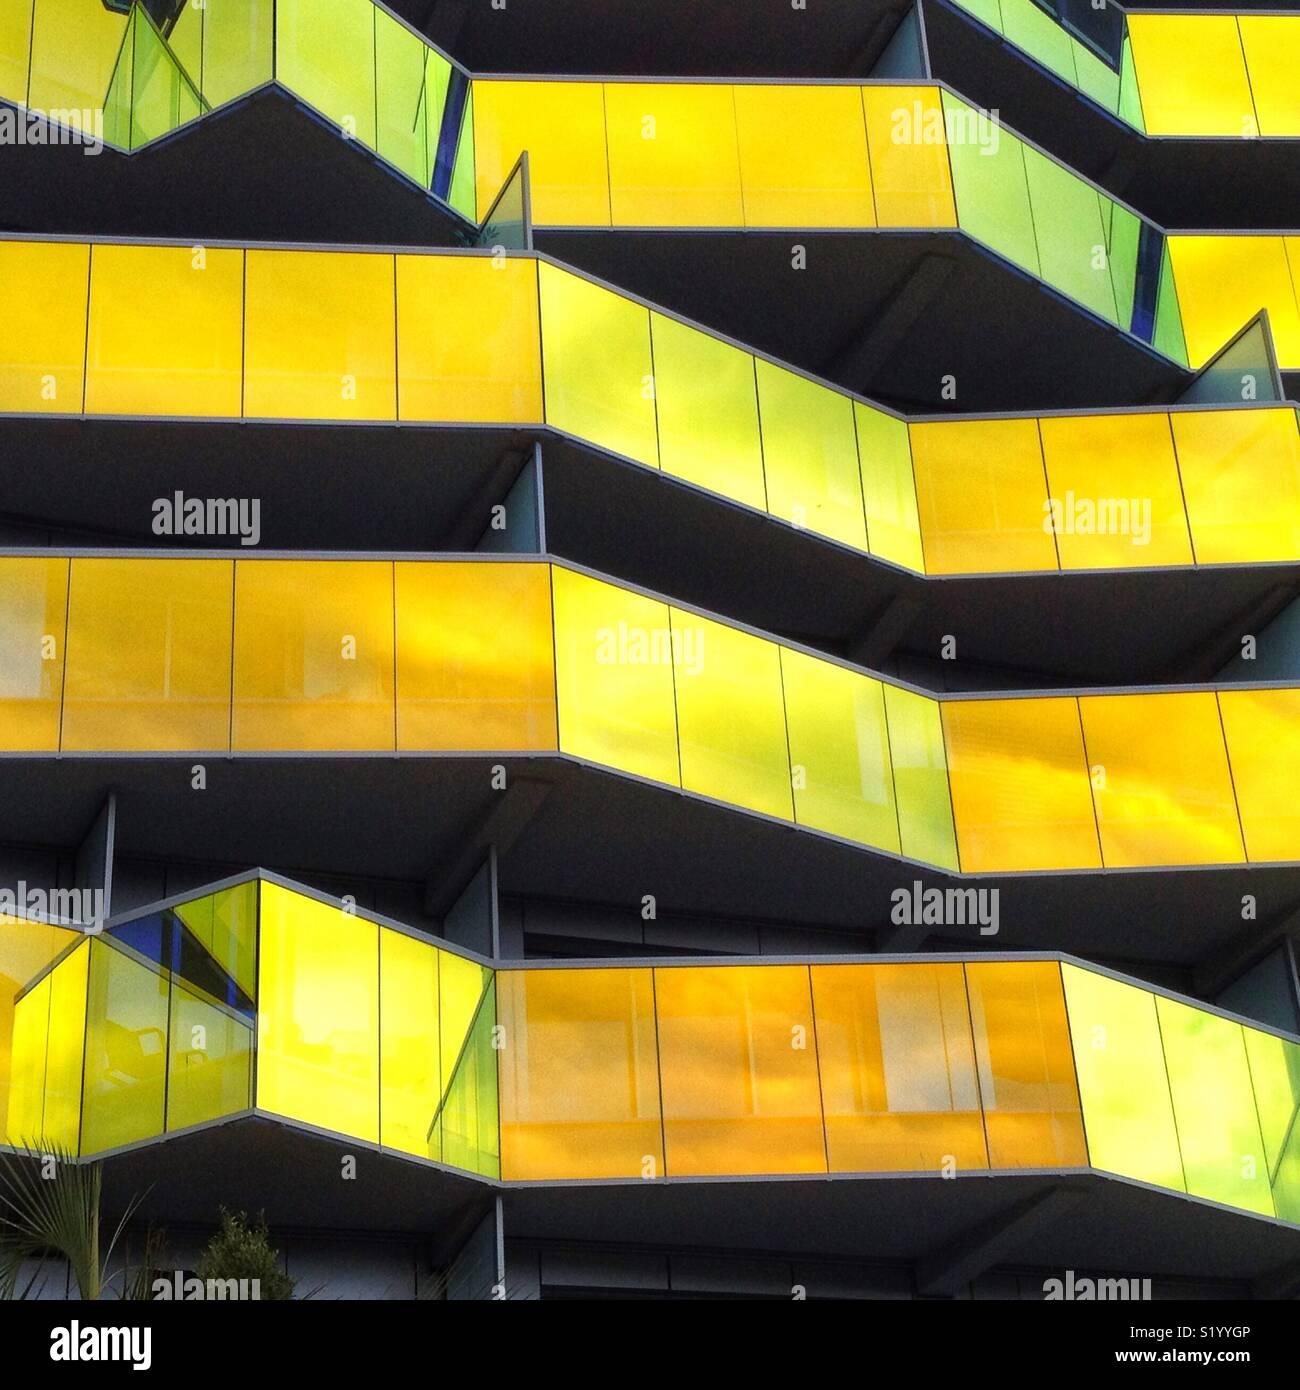 Koh-I-Noor Building, Montpellier France - Stock Image